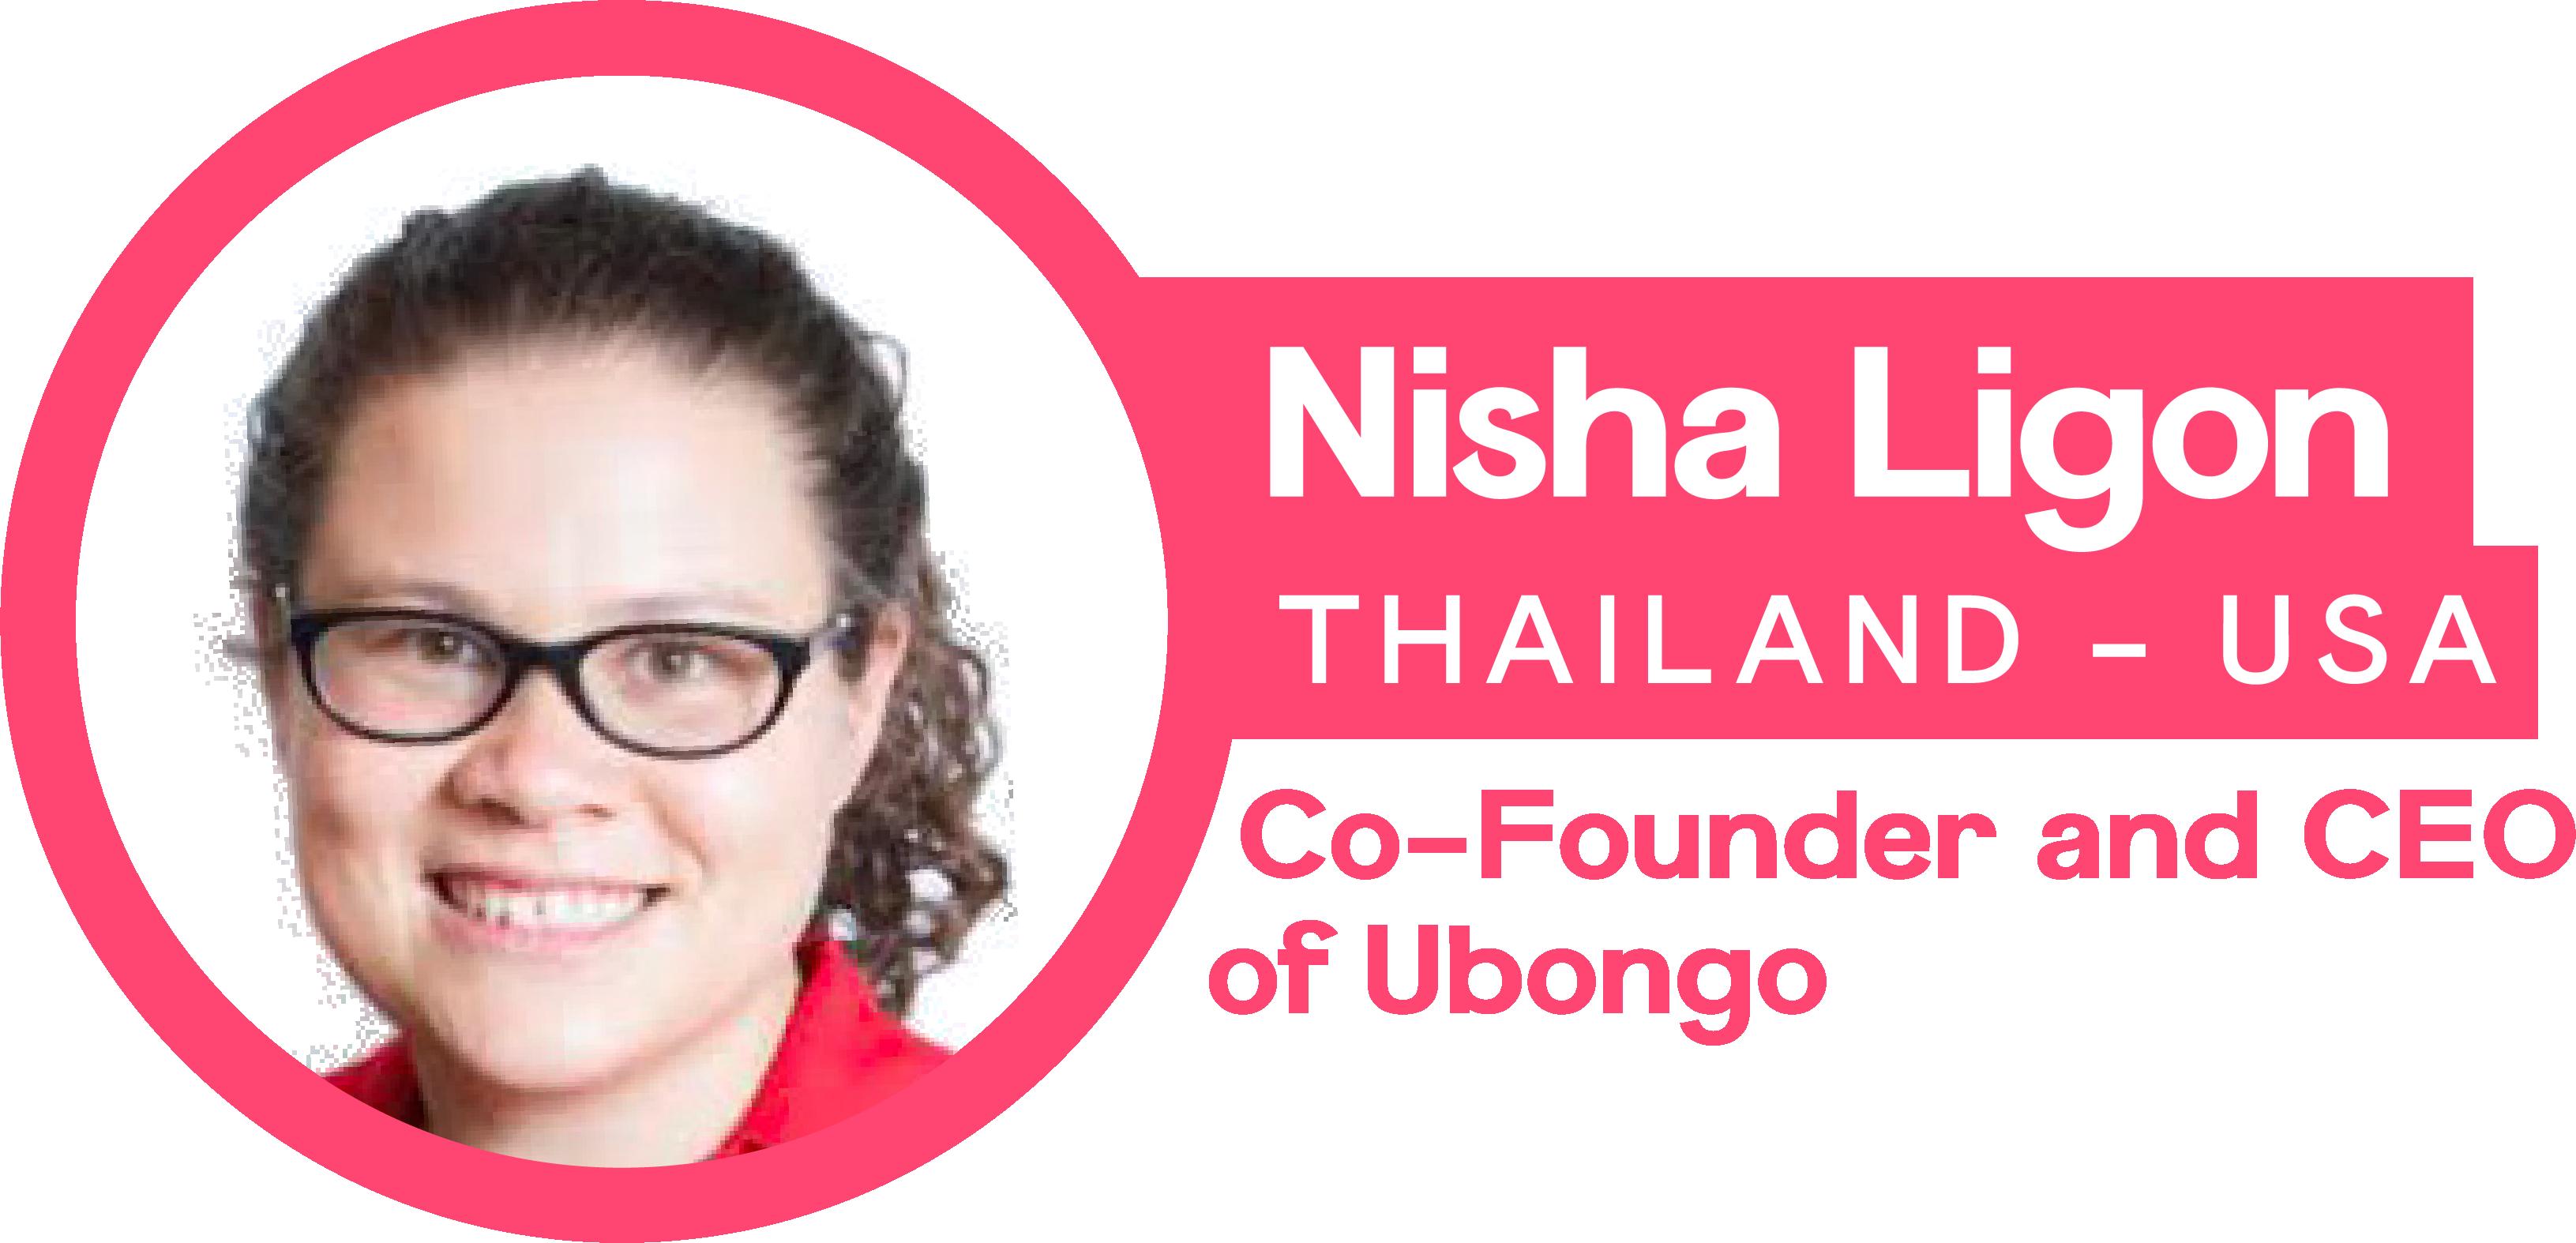 Nisha Ligon